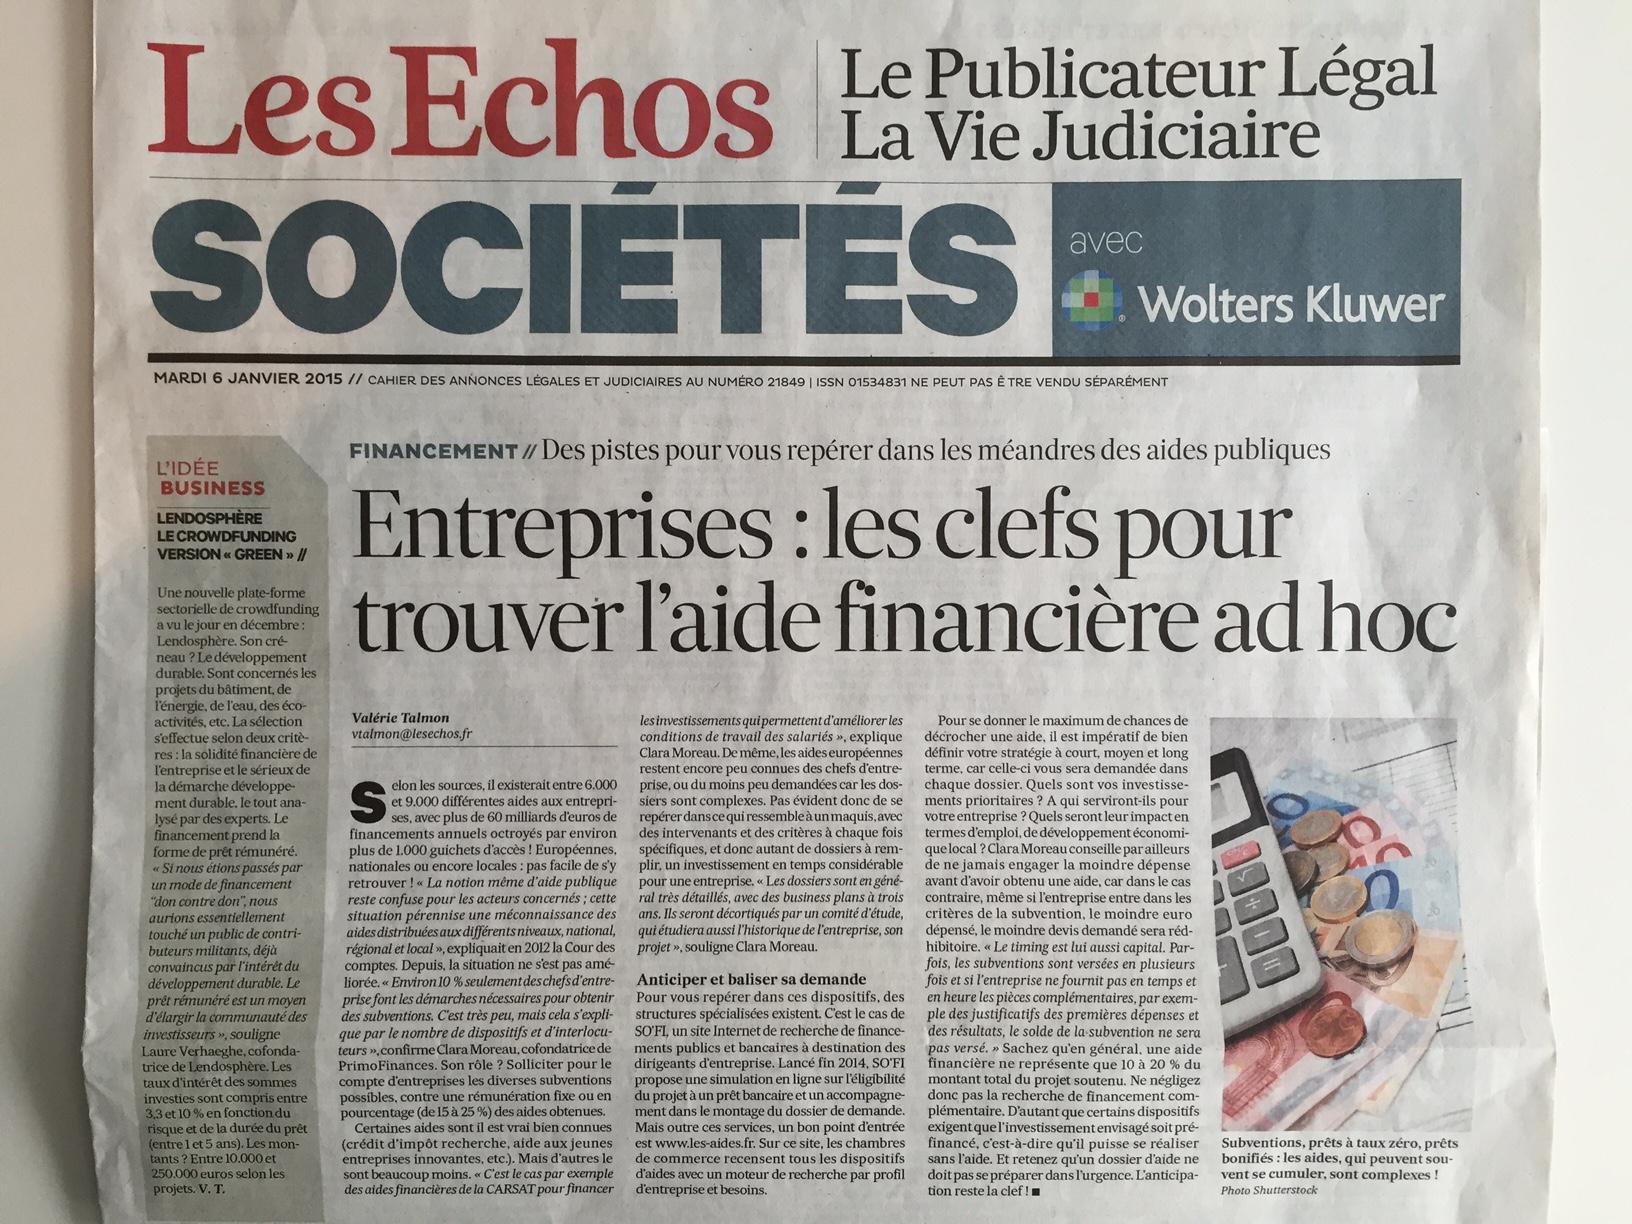 Les Echos - Mardi 6 janvier 2015